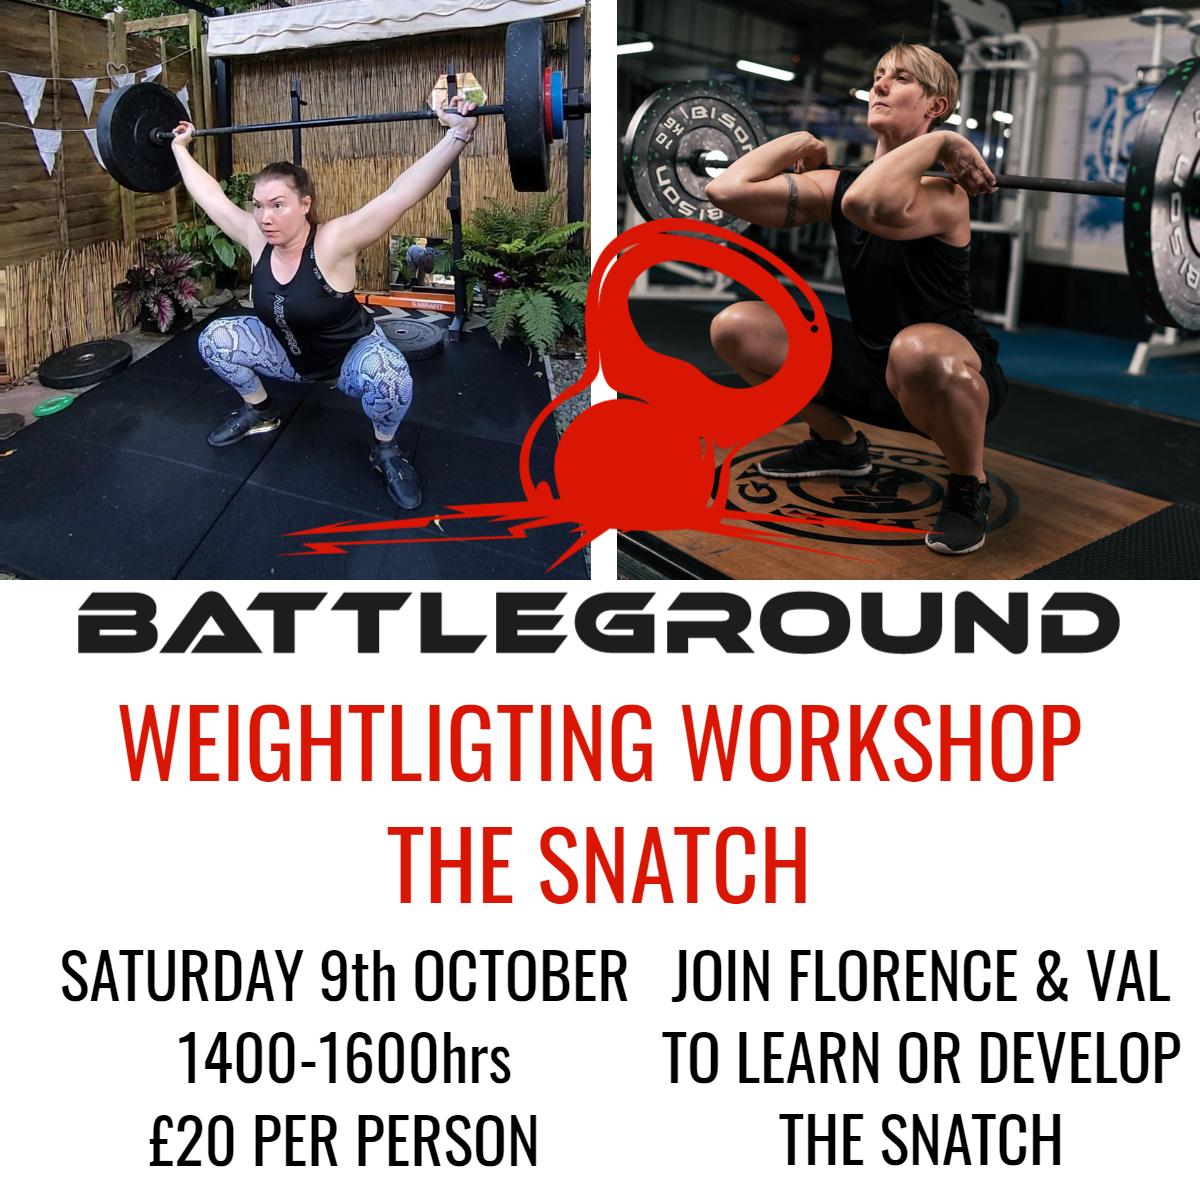 The Snatch - Weightlifting Workshop